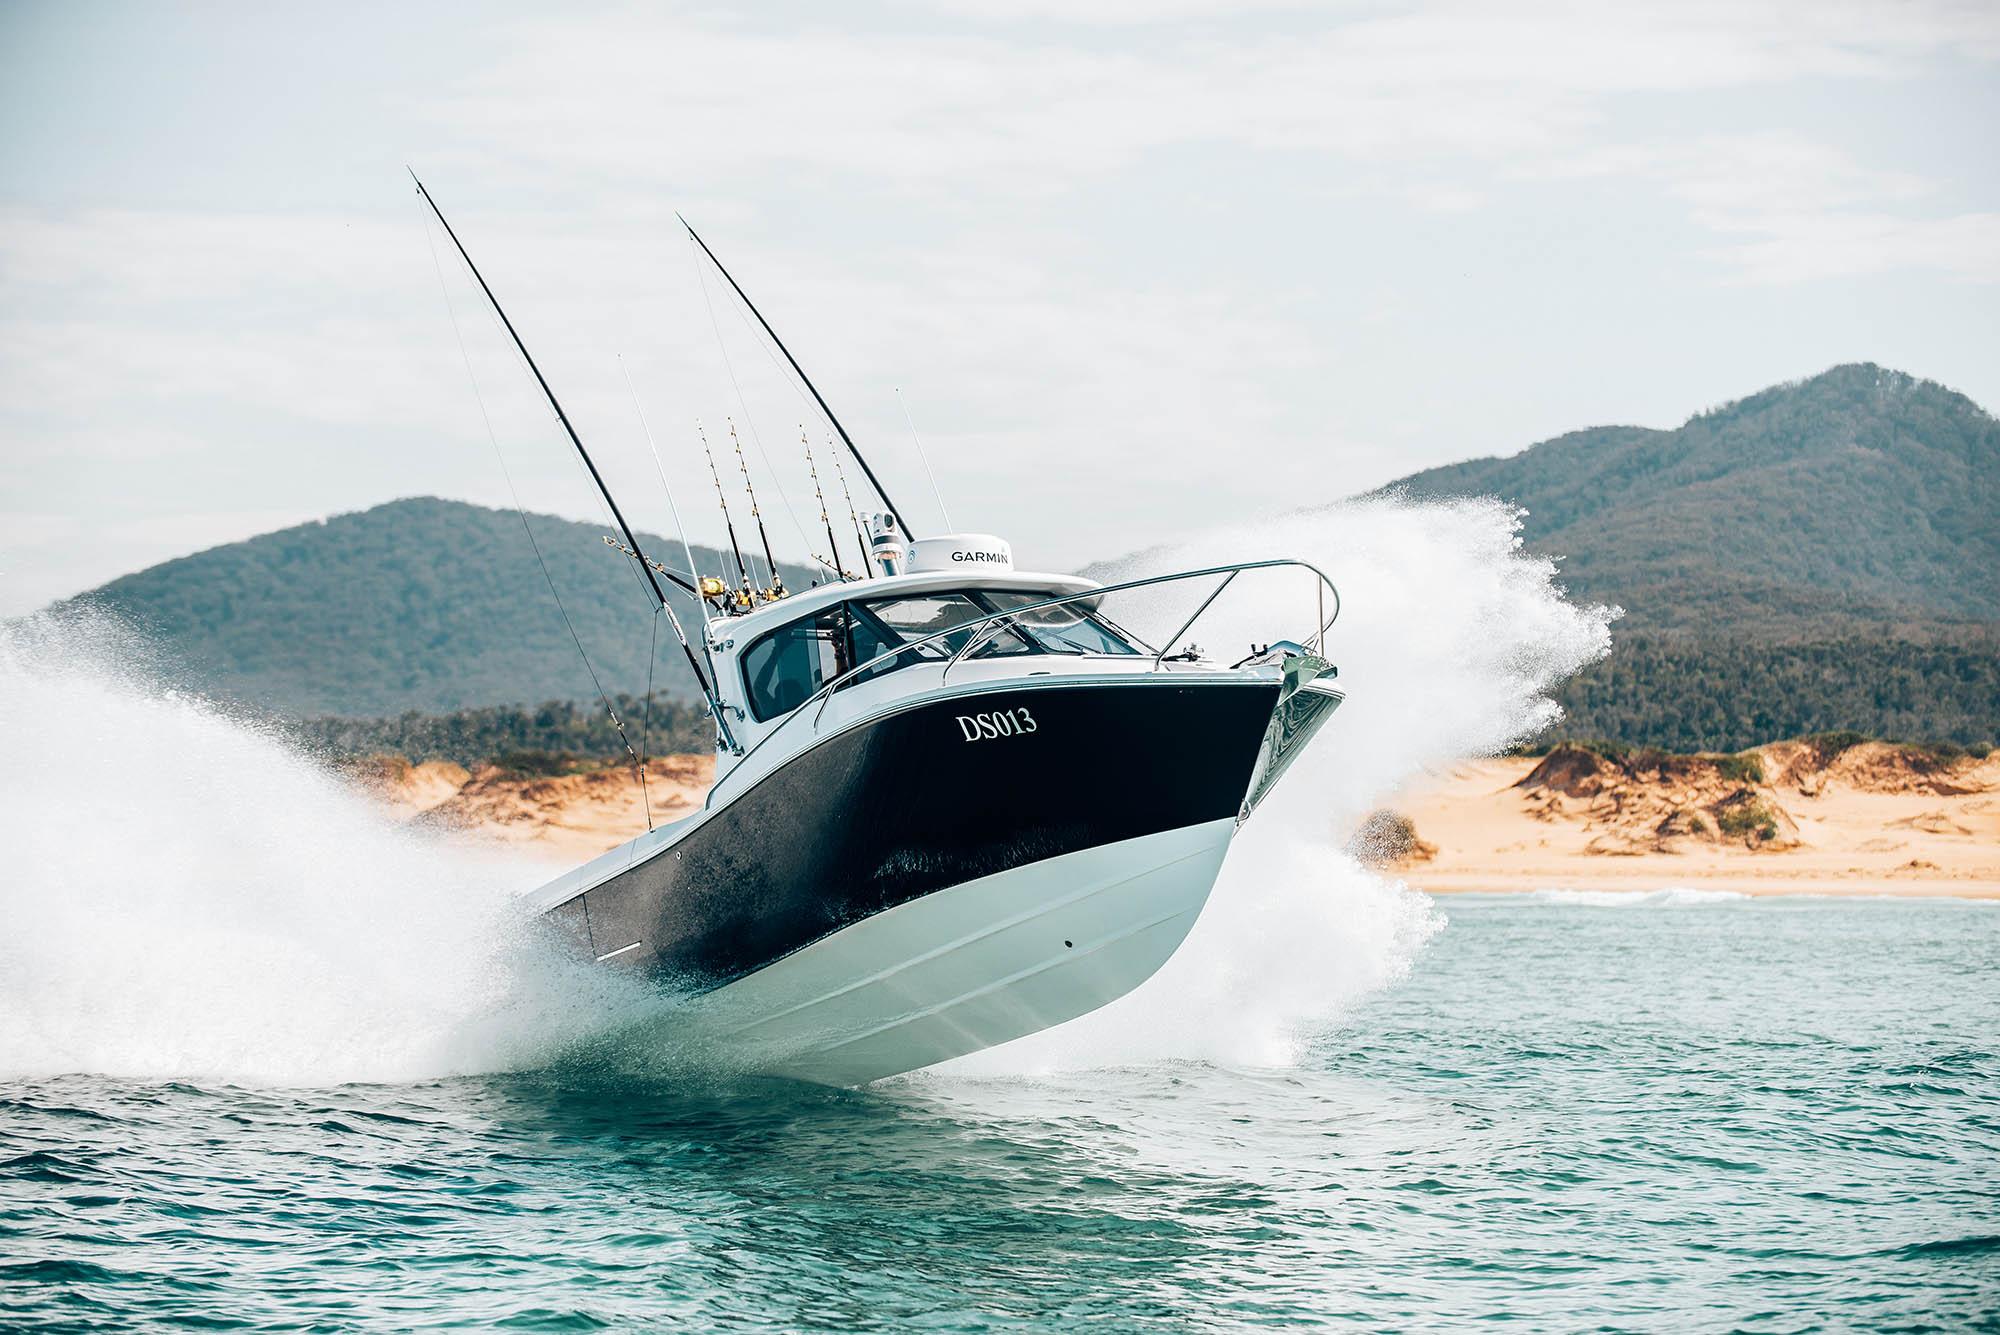 veitch-boat-27-21